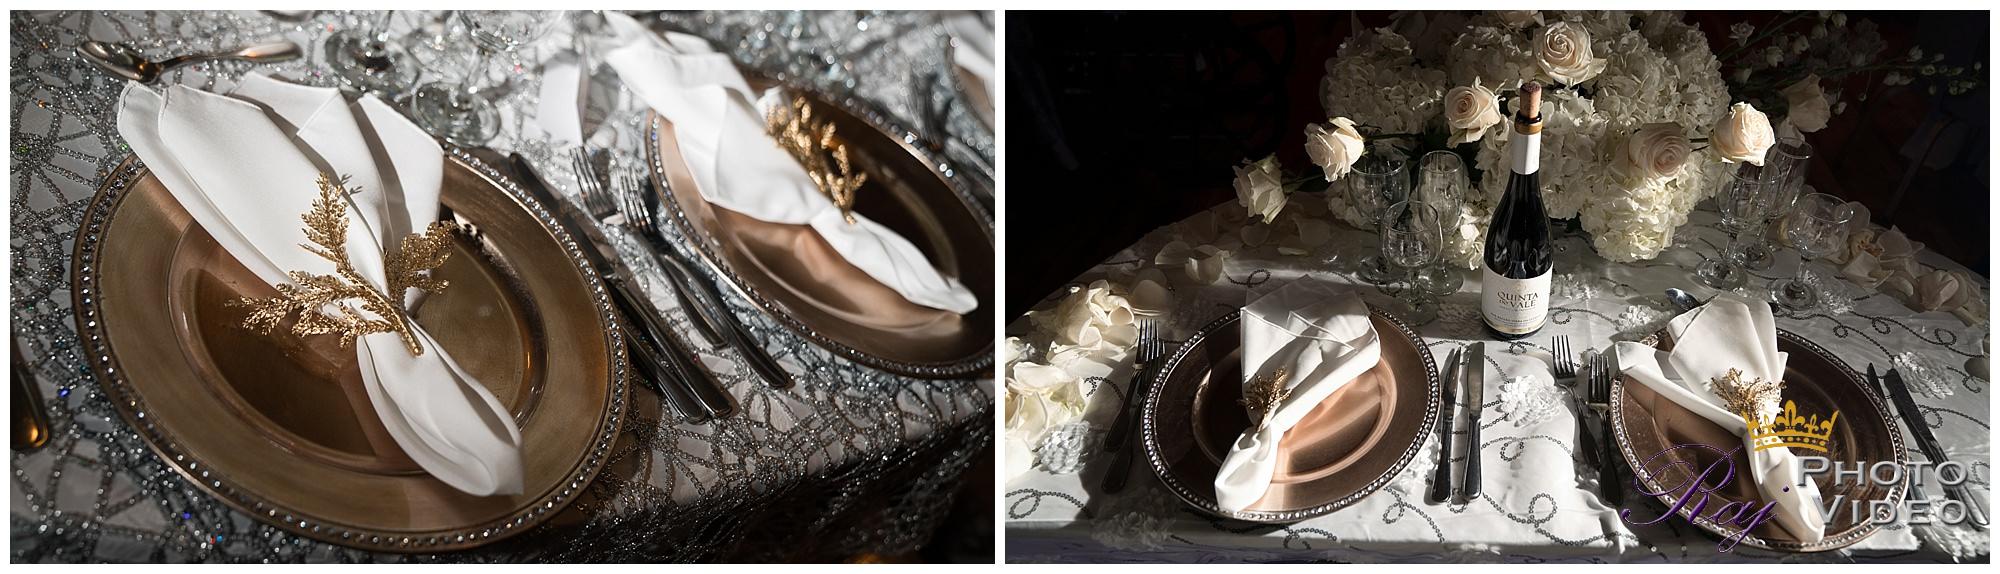 The-Armory-Perth-Amboy-NJ-Catholic-Wedding-Yudelkis-Stephen-18.jpg